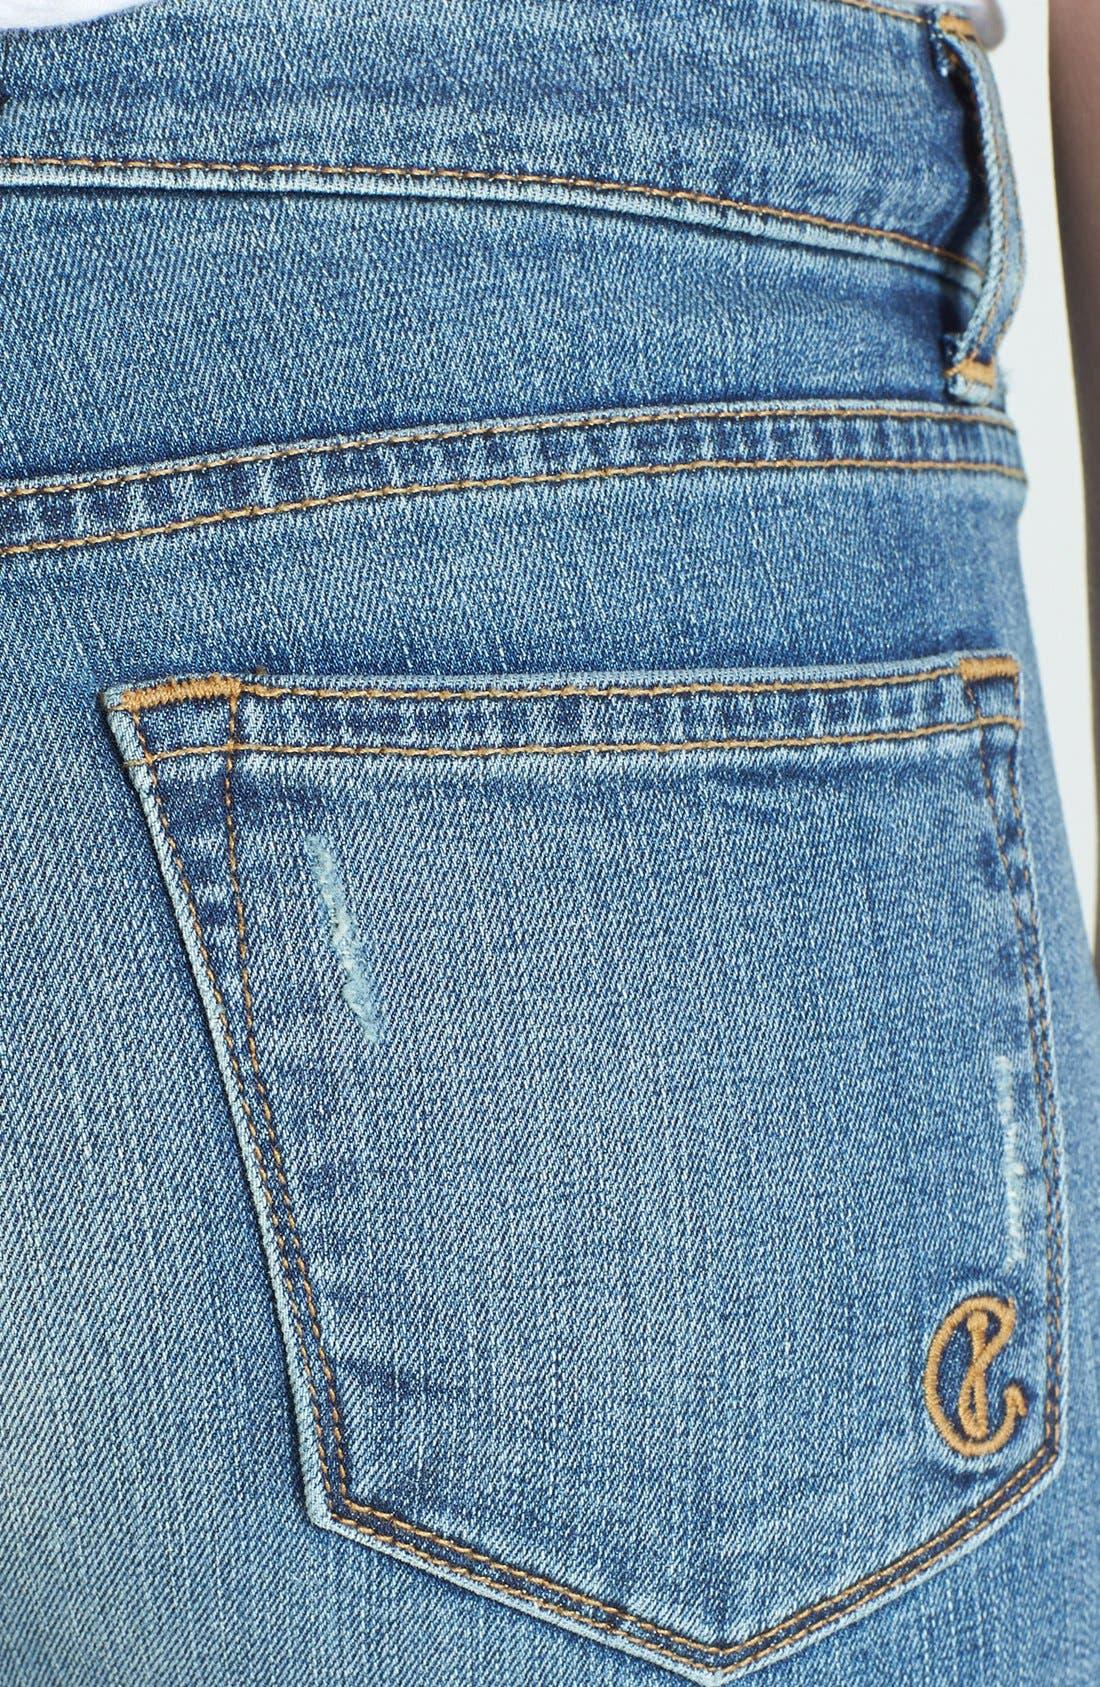 Alternate Image 3  - CJ by Cookie Johnson 'Grace' Bootcut Jeans (Aliamanu)